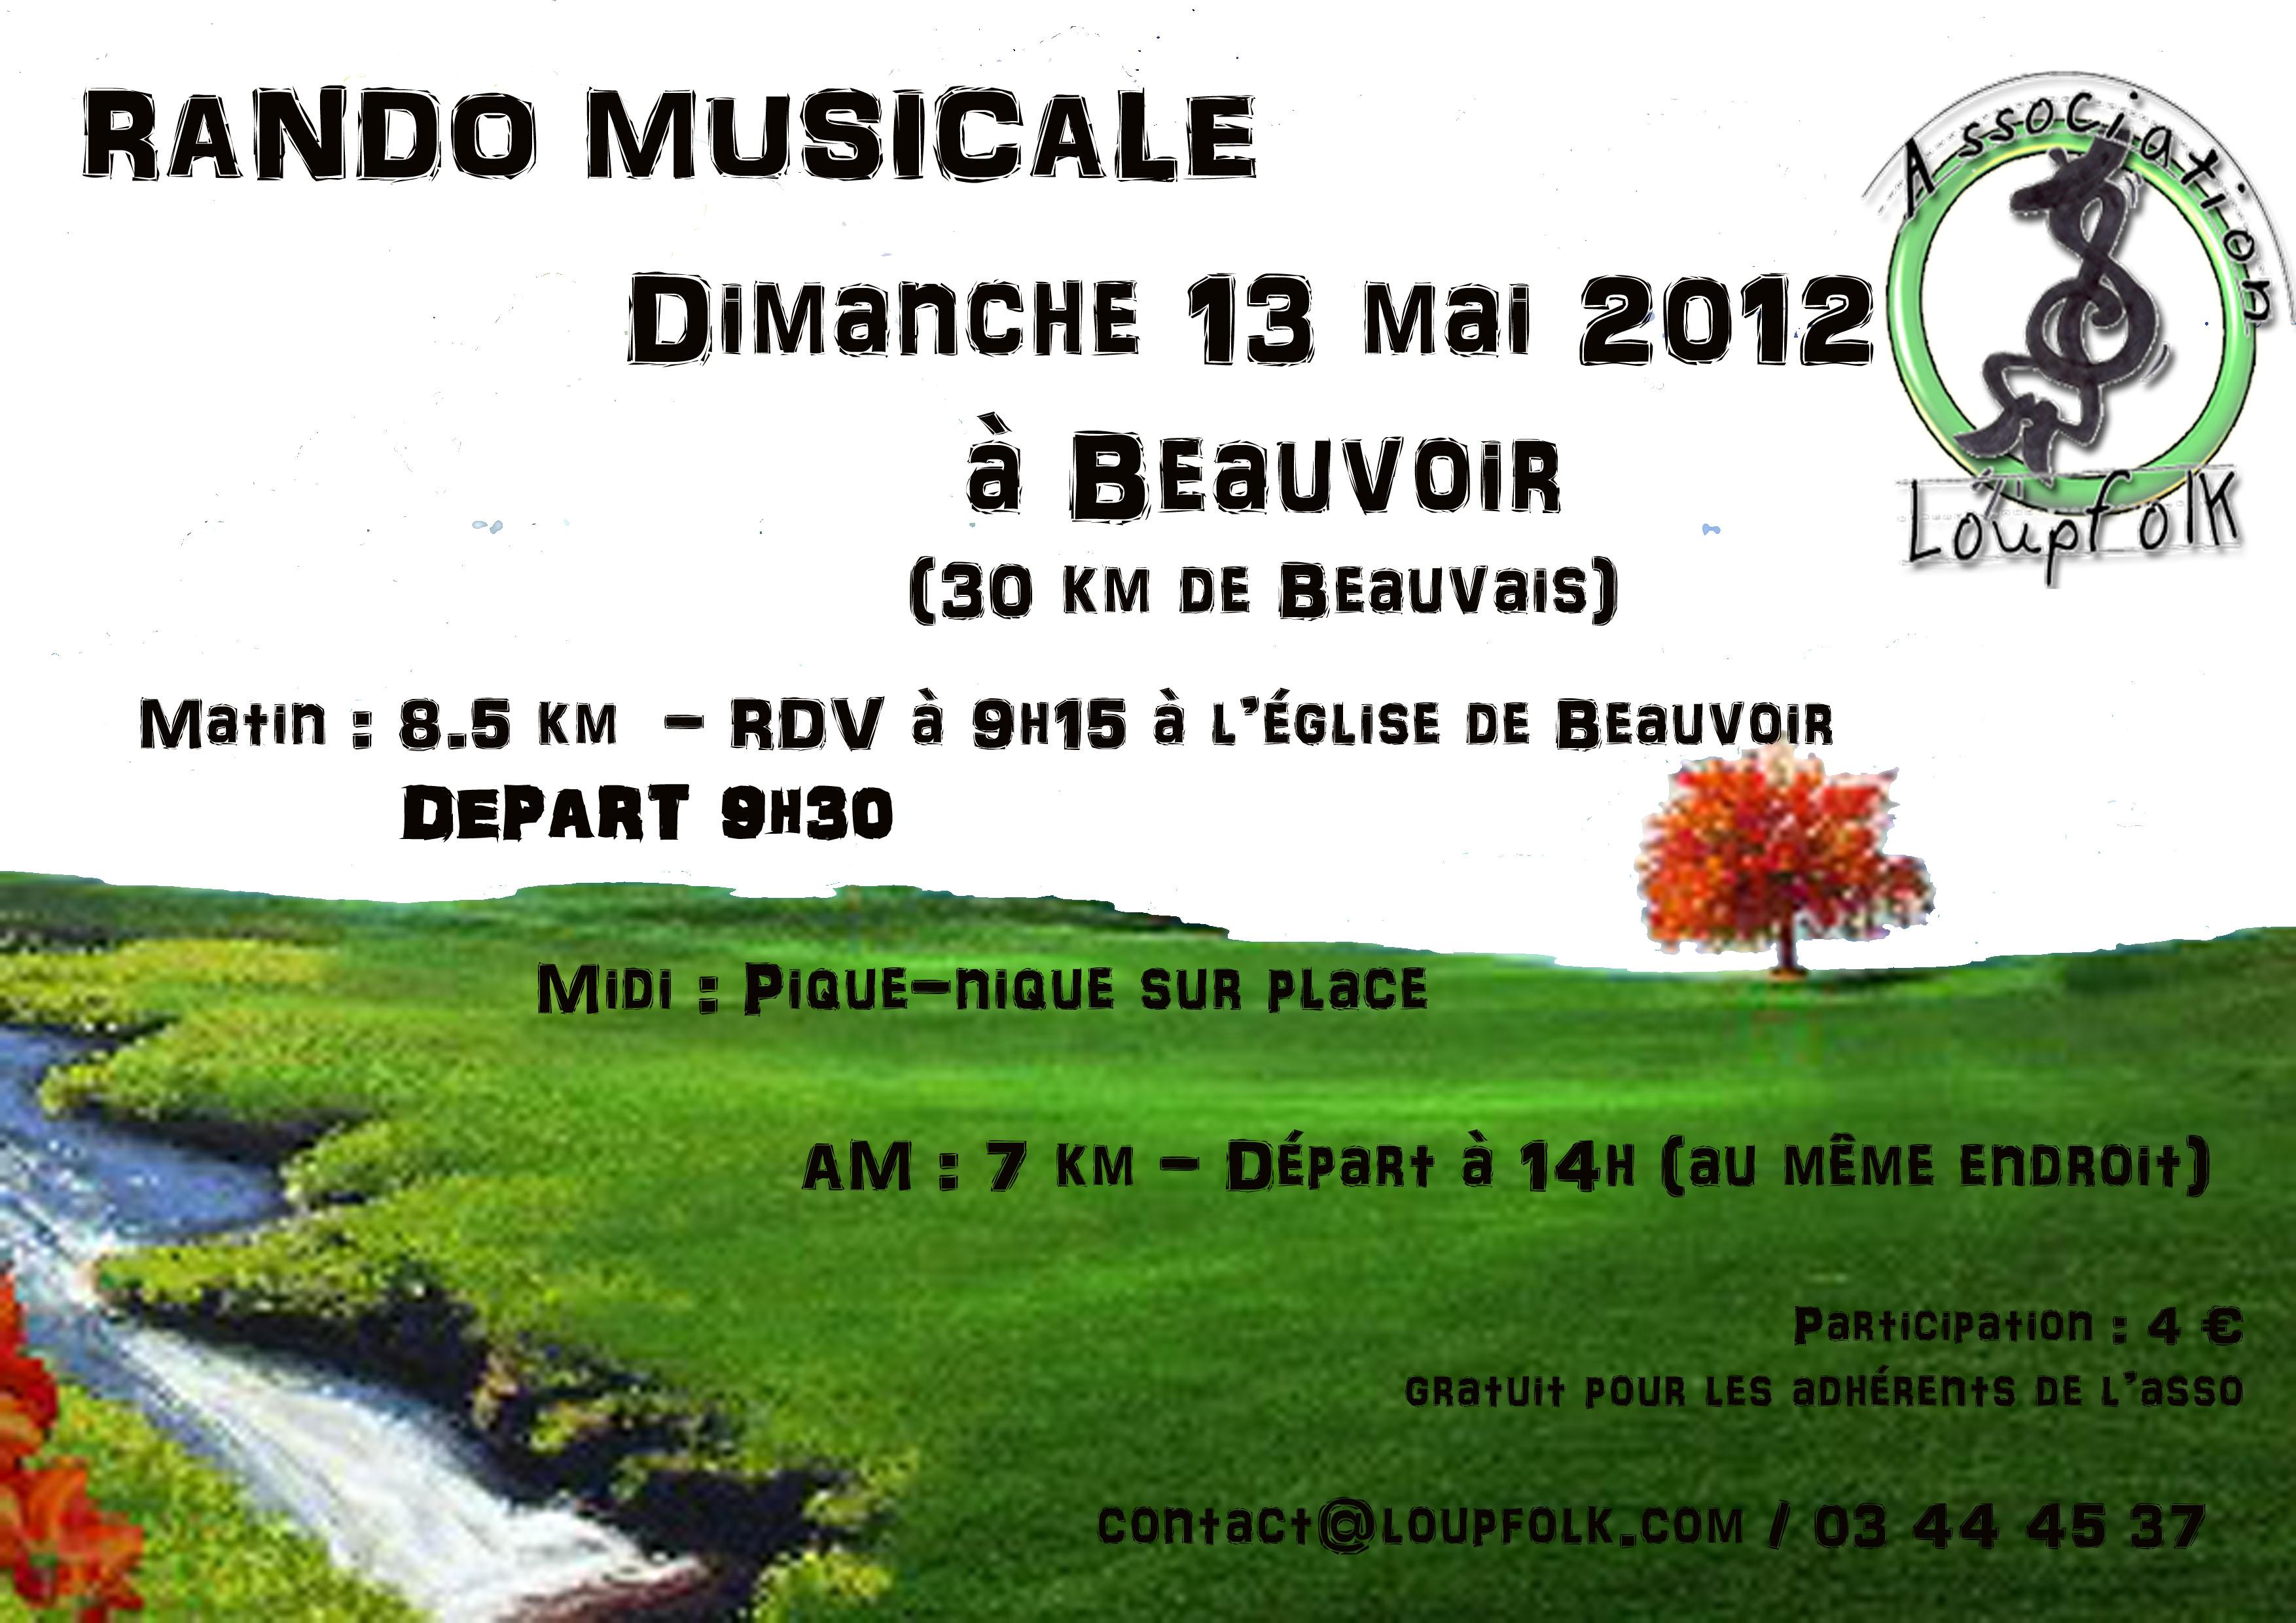 Randonnée musicale Loupfolk dimanche 13 mai à Beauvoir (60120)